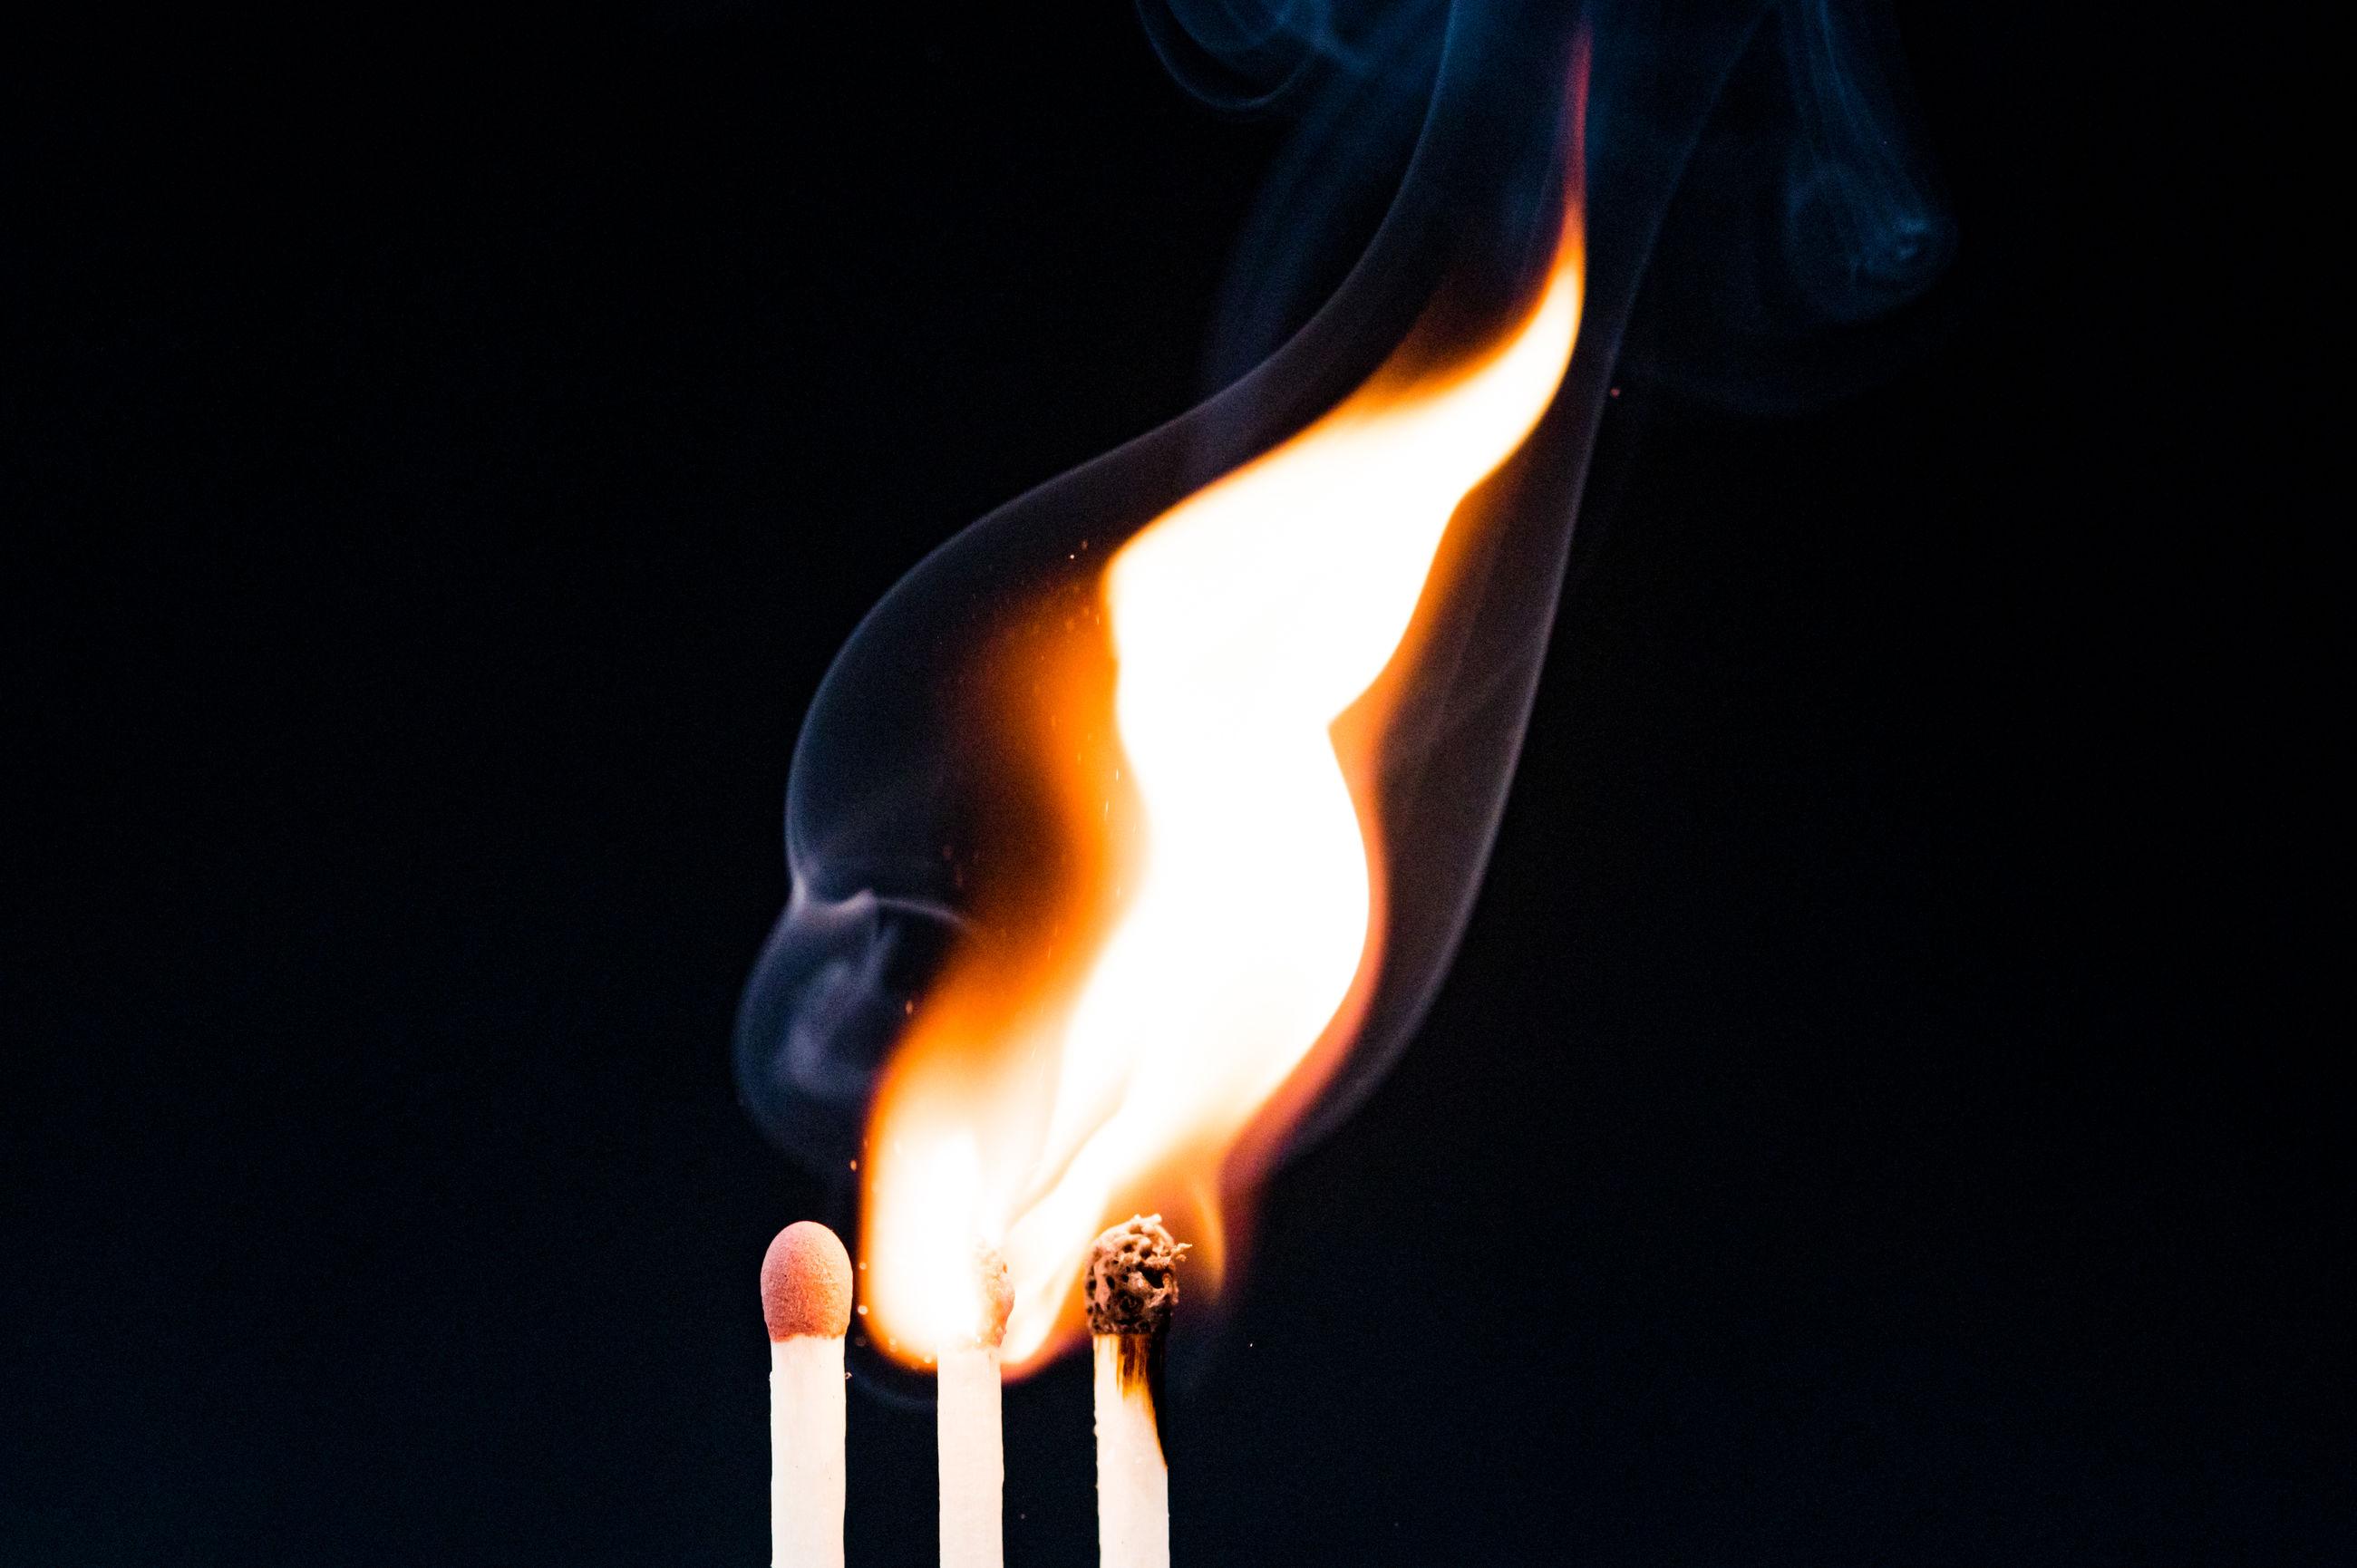 Matchsticks burning